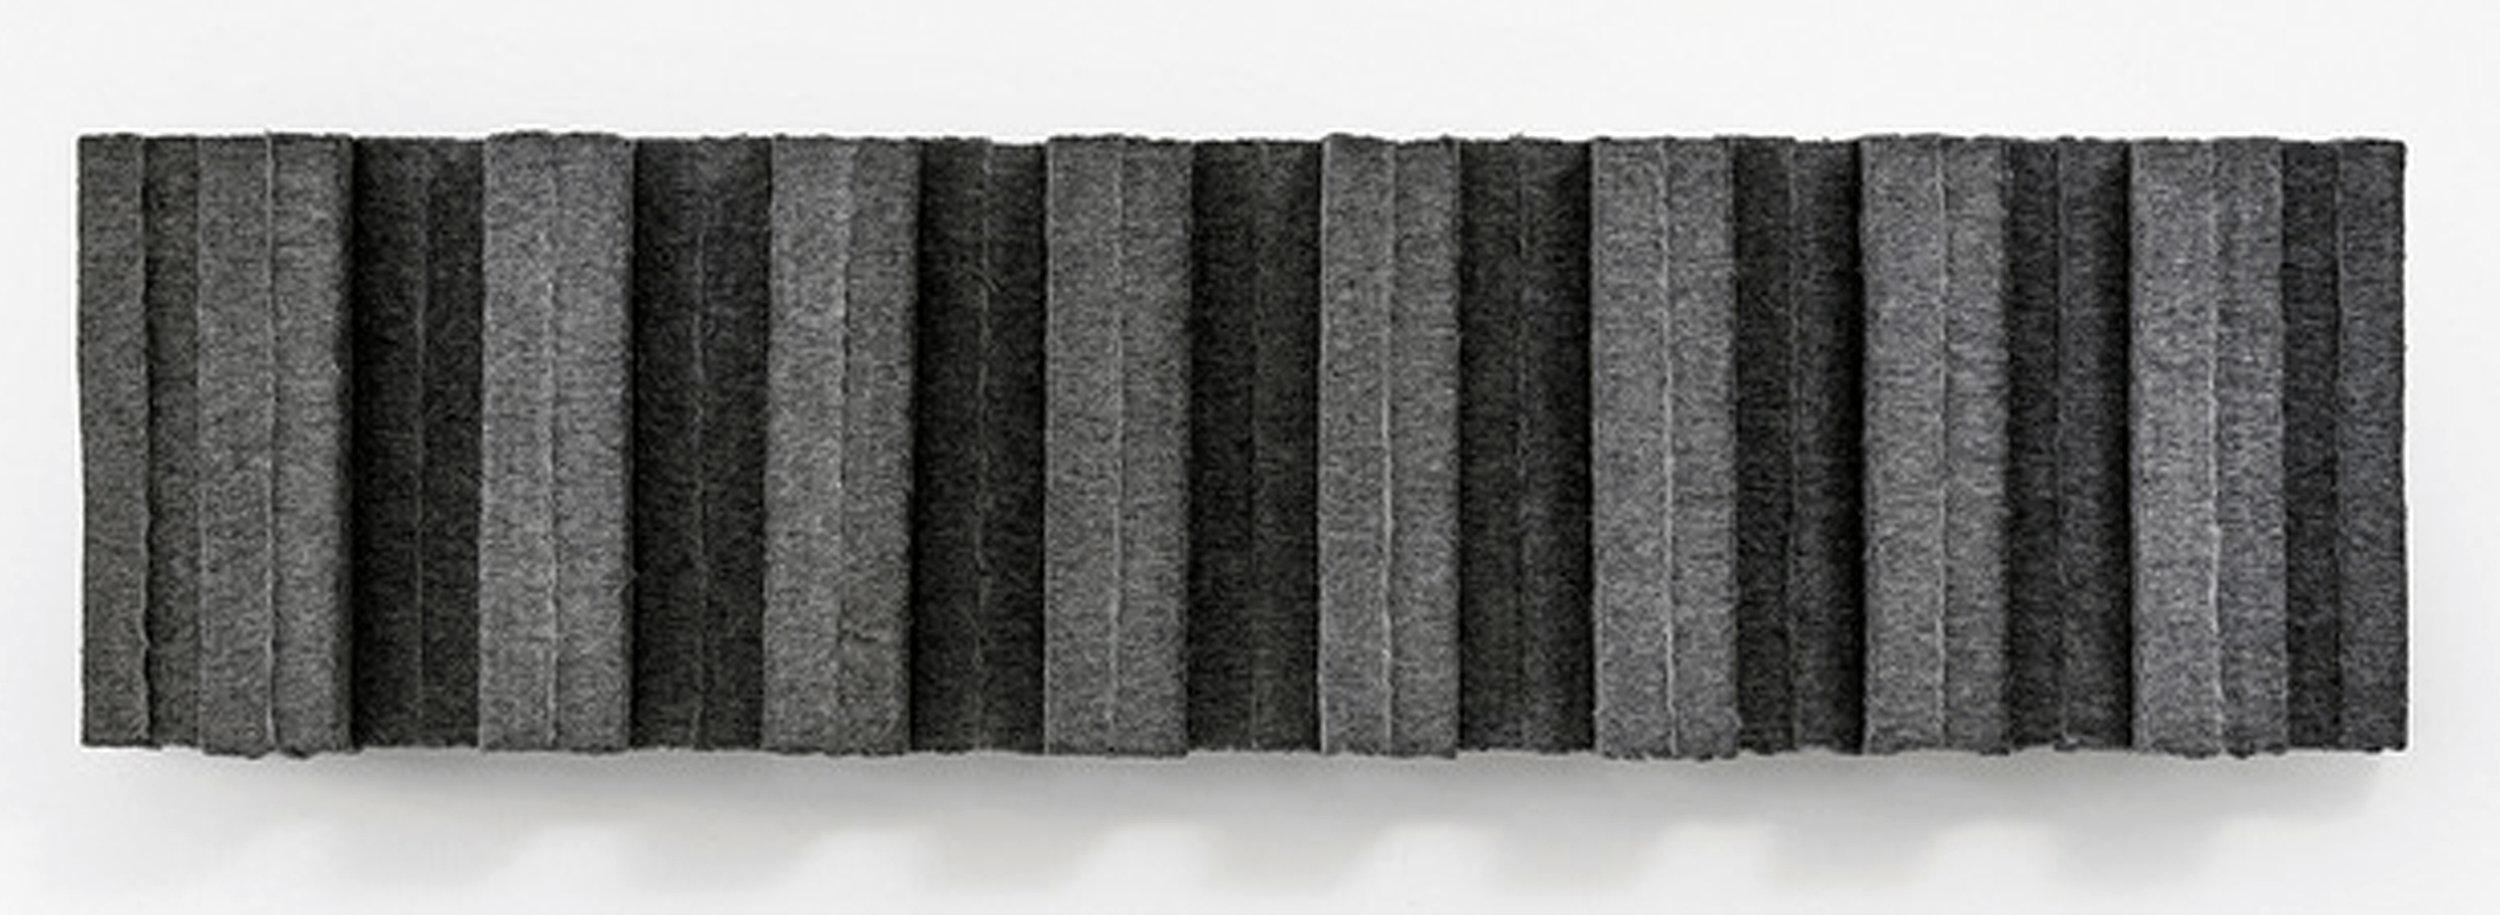 MARCIE MILLER GROSS   Sheared #3, 18 x 68.5 x 7 inches / 46 x 174 x 18 cm, wool industrial felt, 2012